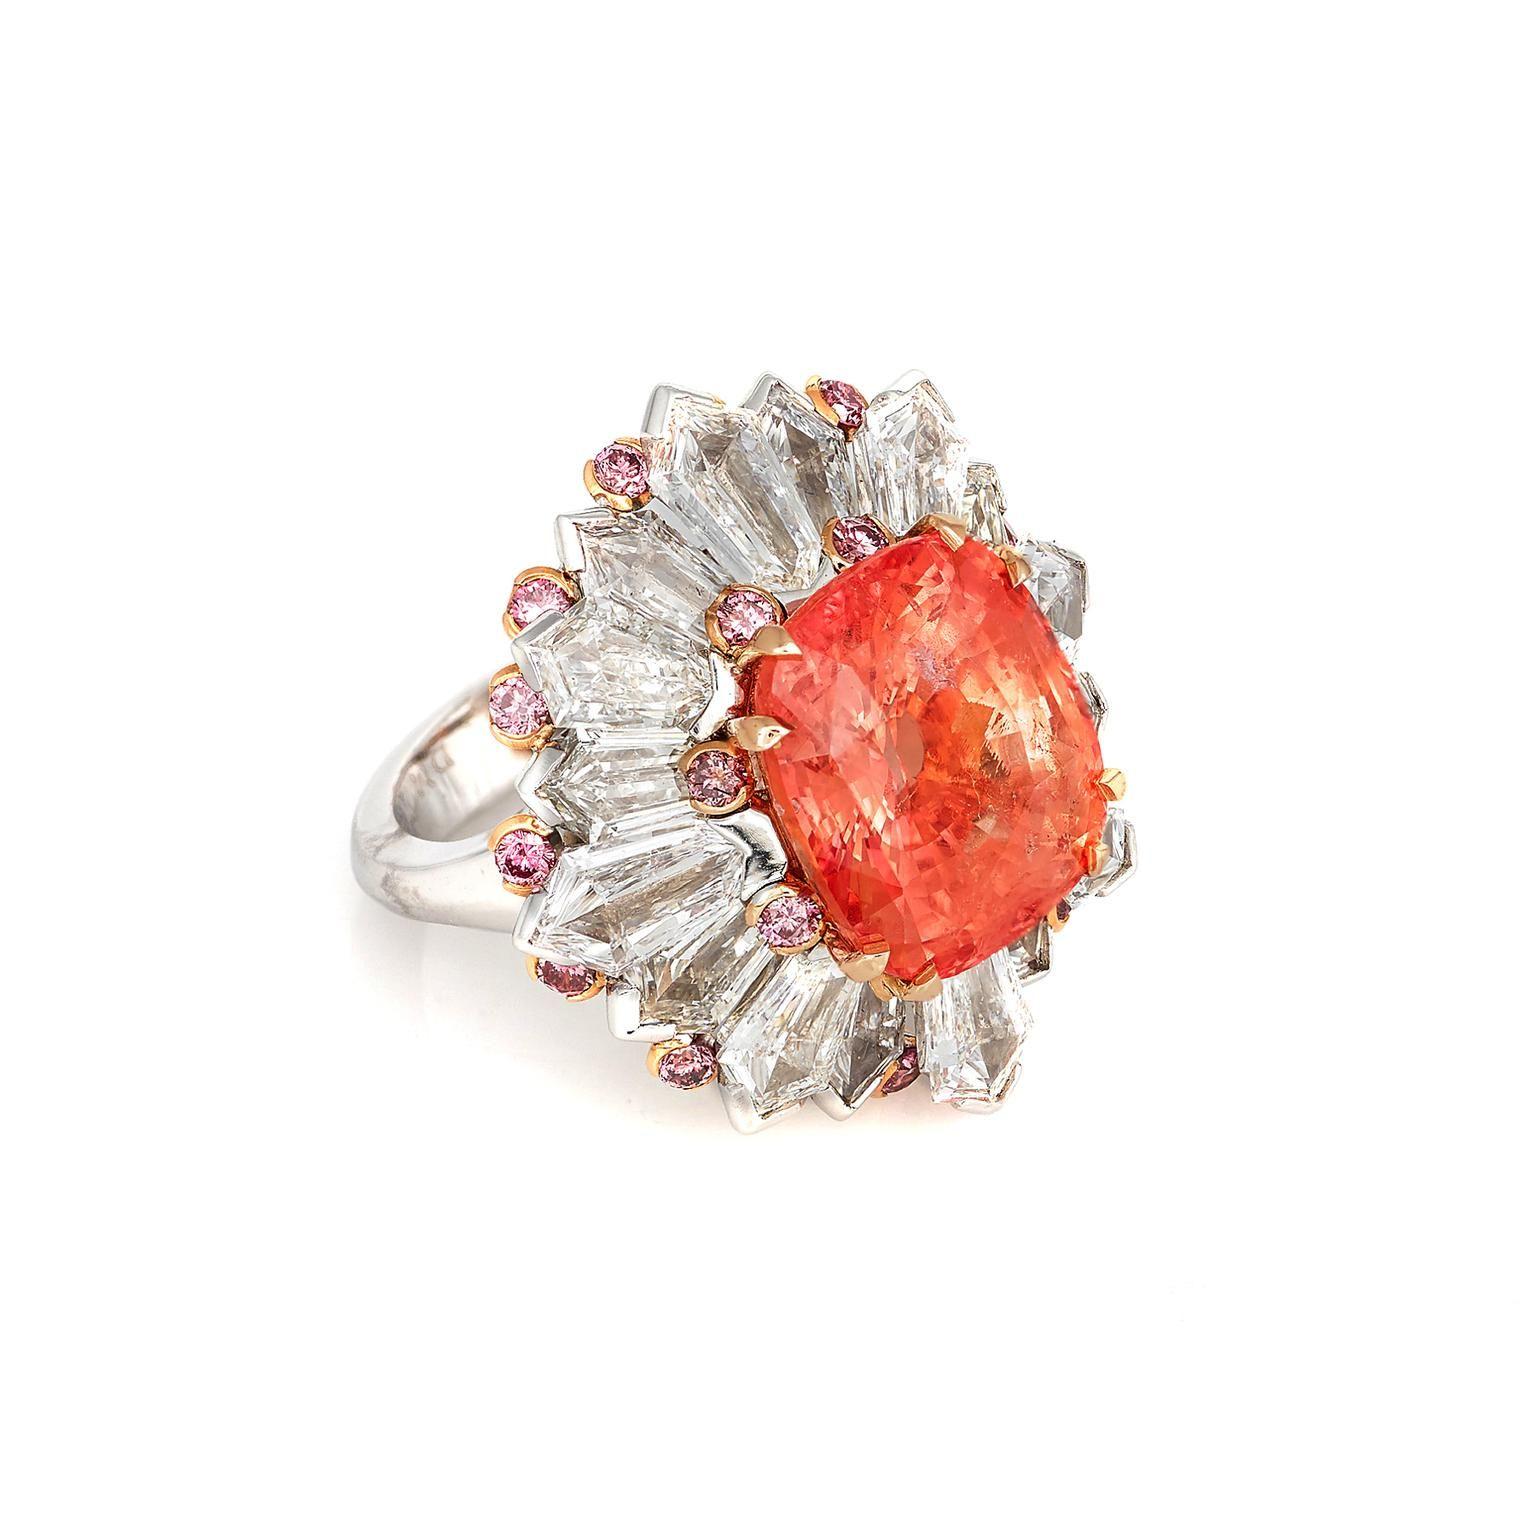 David Morris peach coloured carat Padparadascha sapphire from